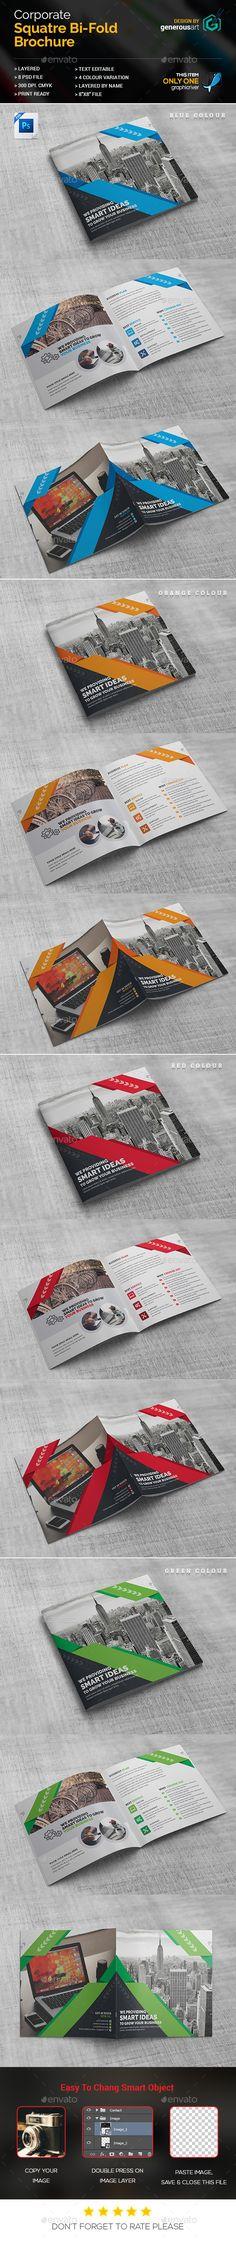 Business Square Bi-Fold Brochure Template PSD. Download here: https://graphicriver.net/item/business-square-bifold/17436745?ref=ksioks